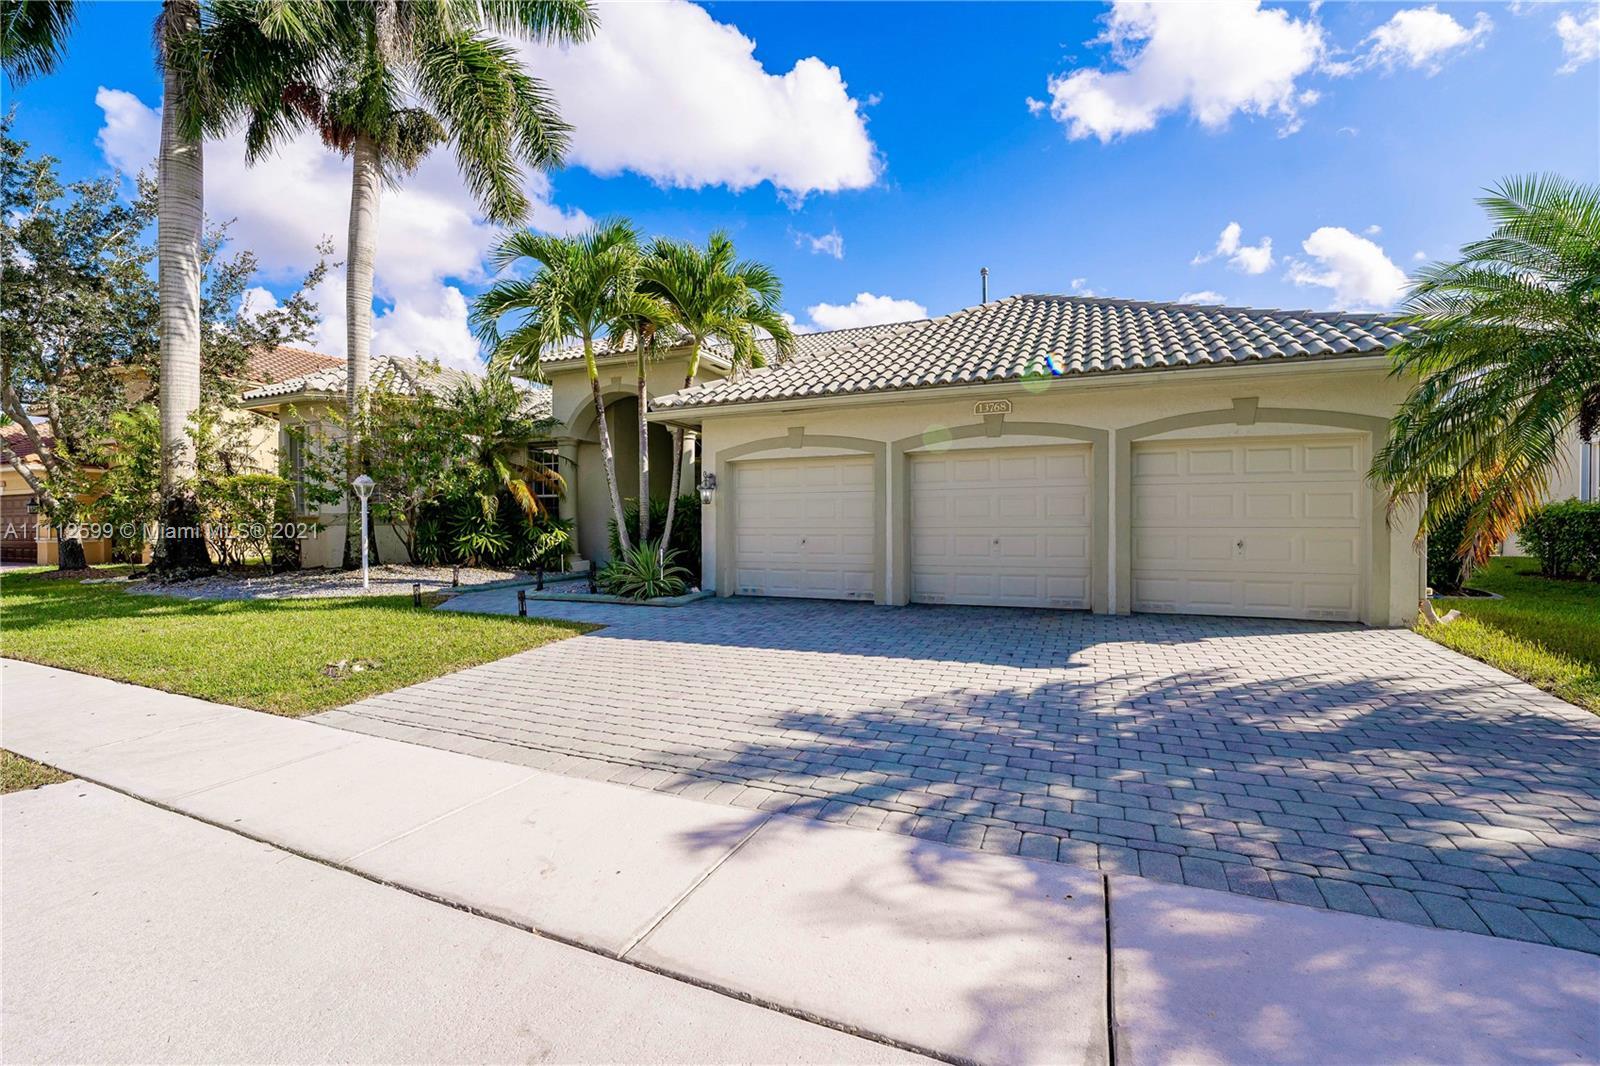 13768 18th Ct, Pembroke Pines, Florida 33028